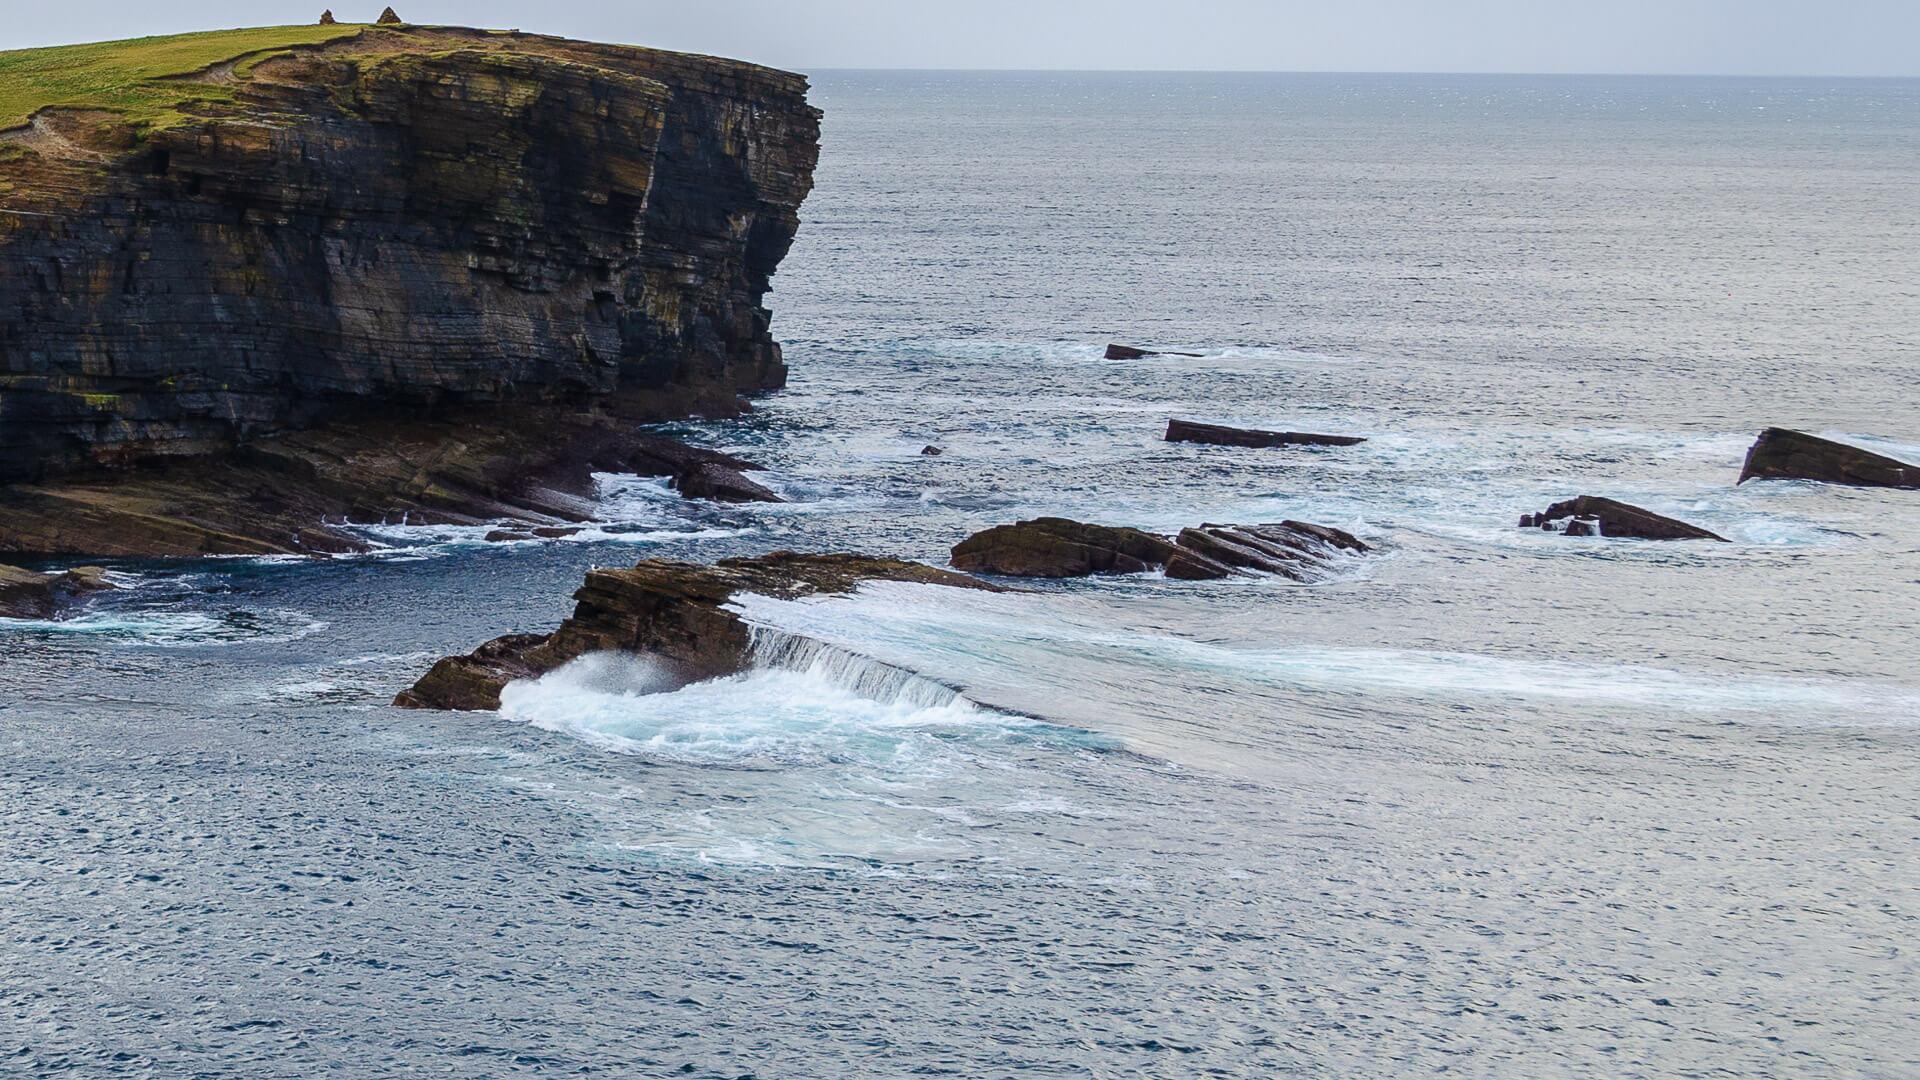 Vor den Klippen liegen Felstafeln im Meer